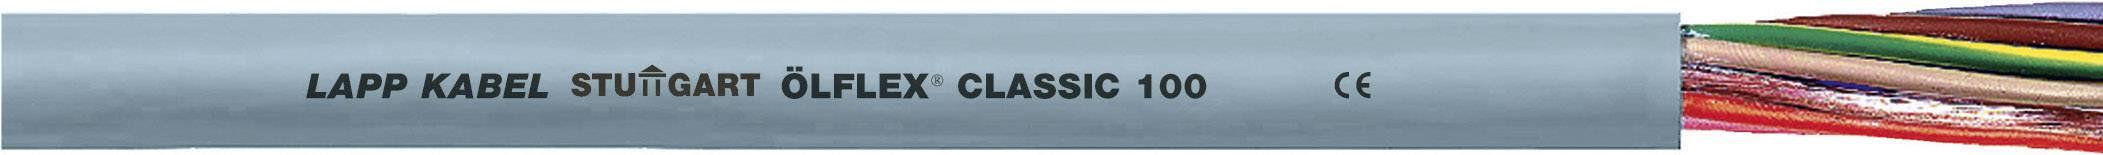 Kabel LappKabel Ölflex CLASSIC 100 10G0,75 (0010029), PVC, 9,6 mm, 500 V, šedá, 50 m